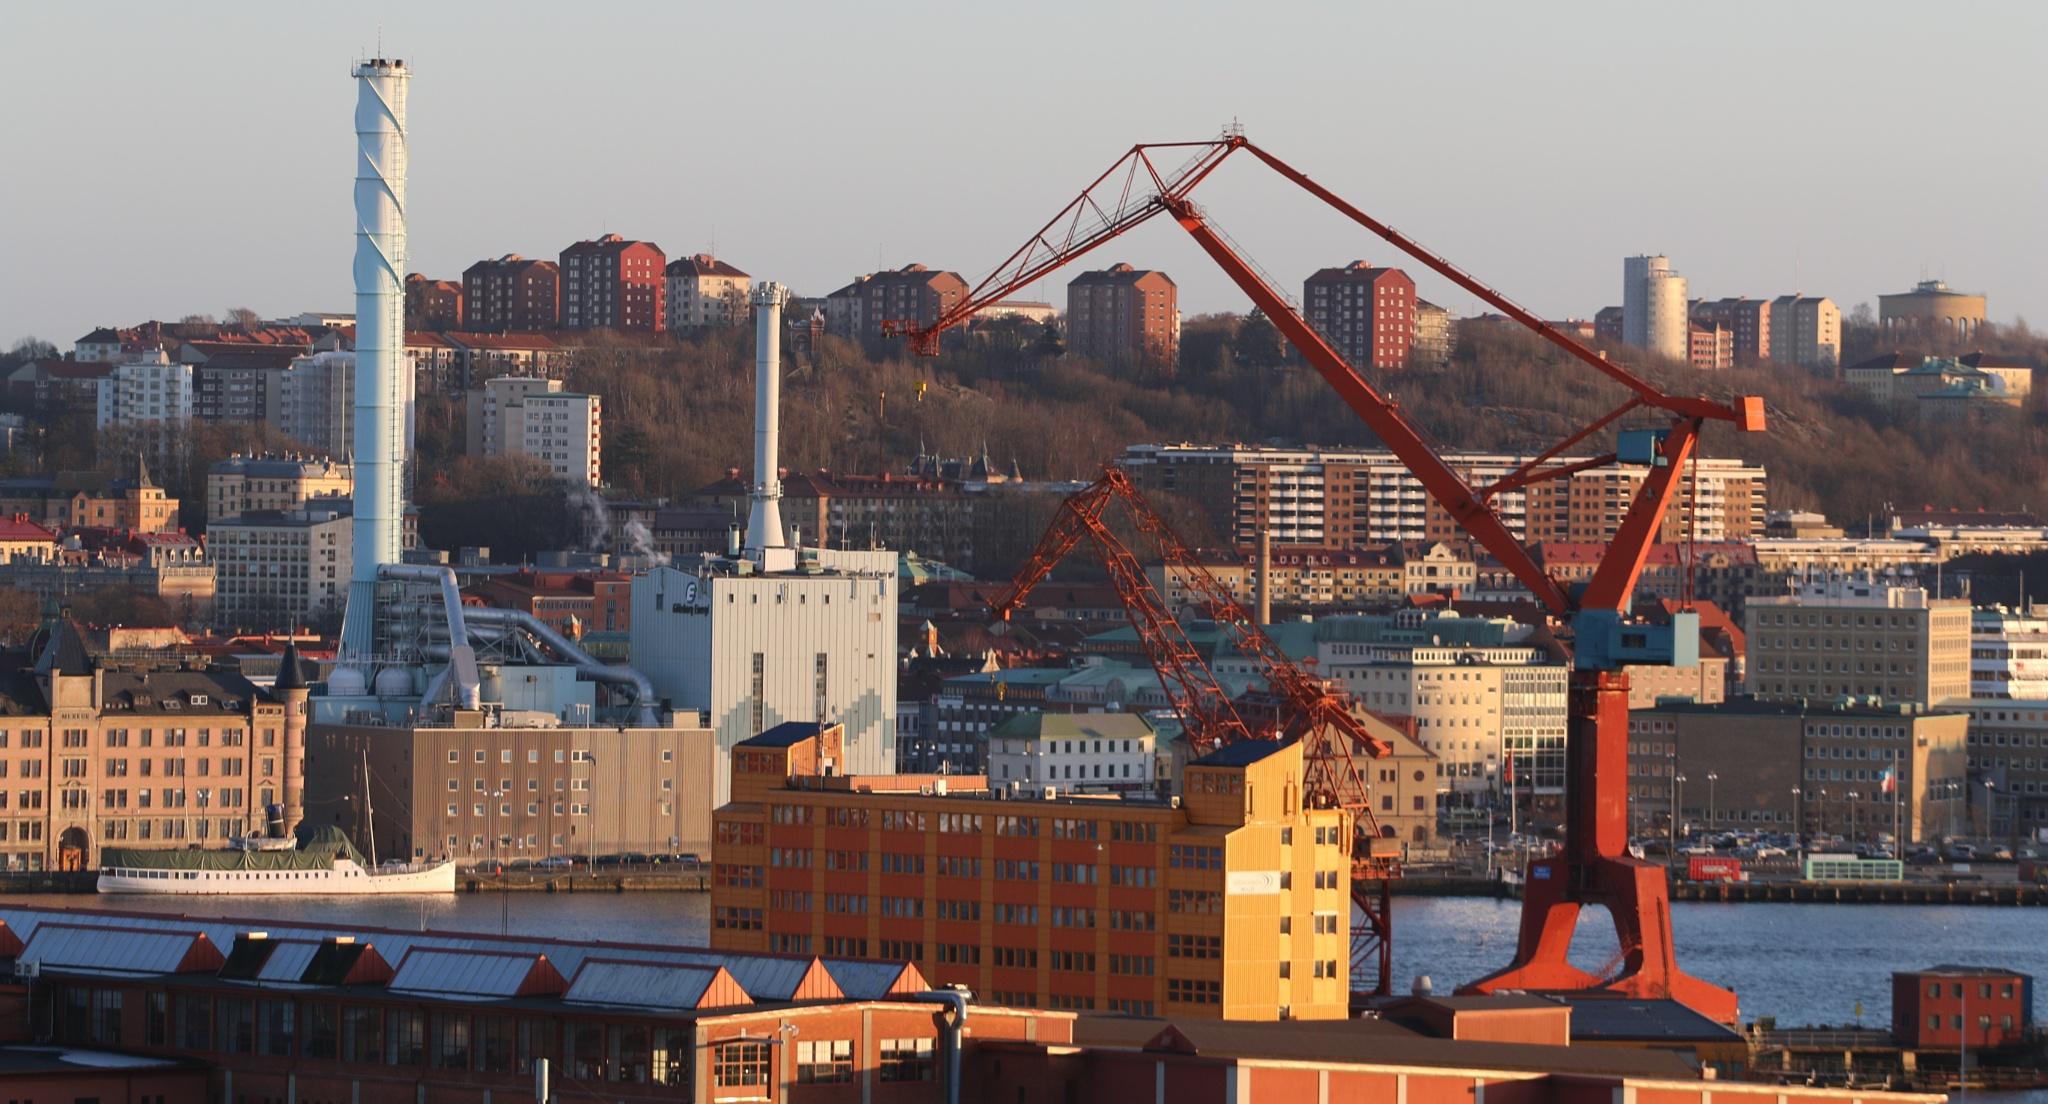 City of Gothenburg by paul_wallen